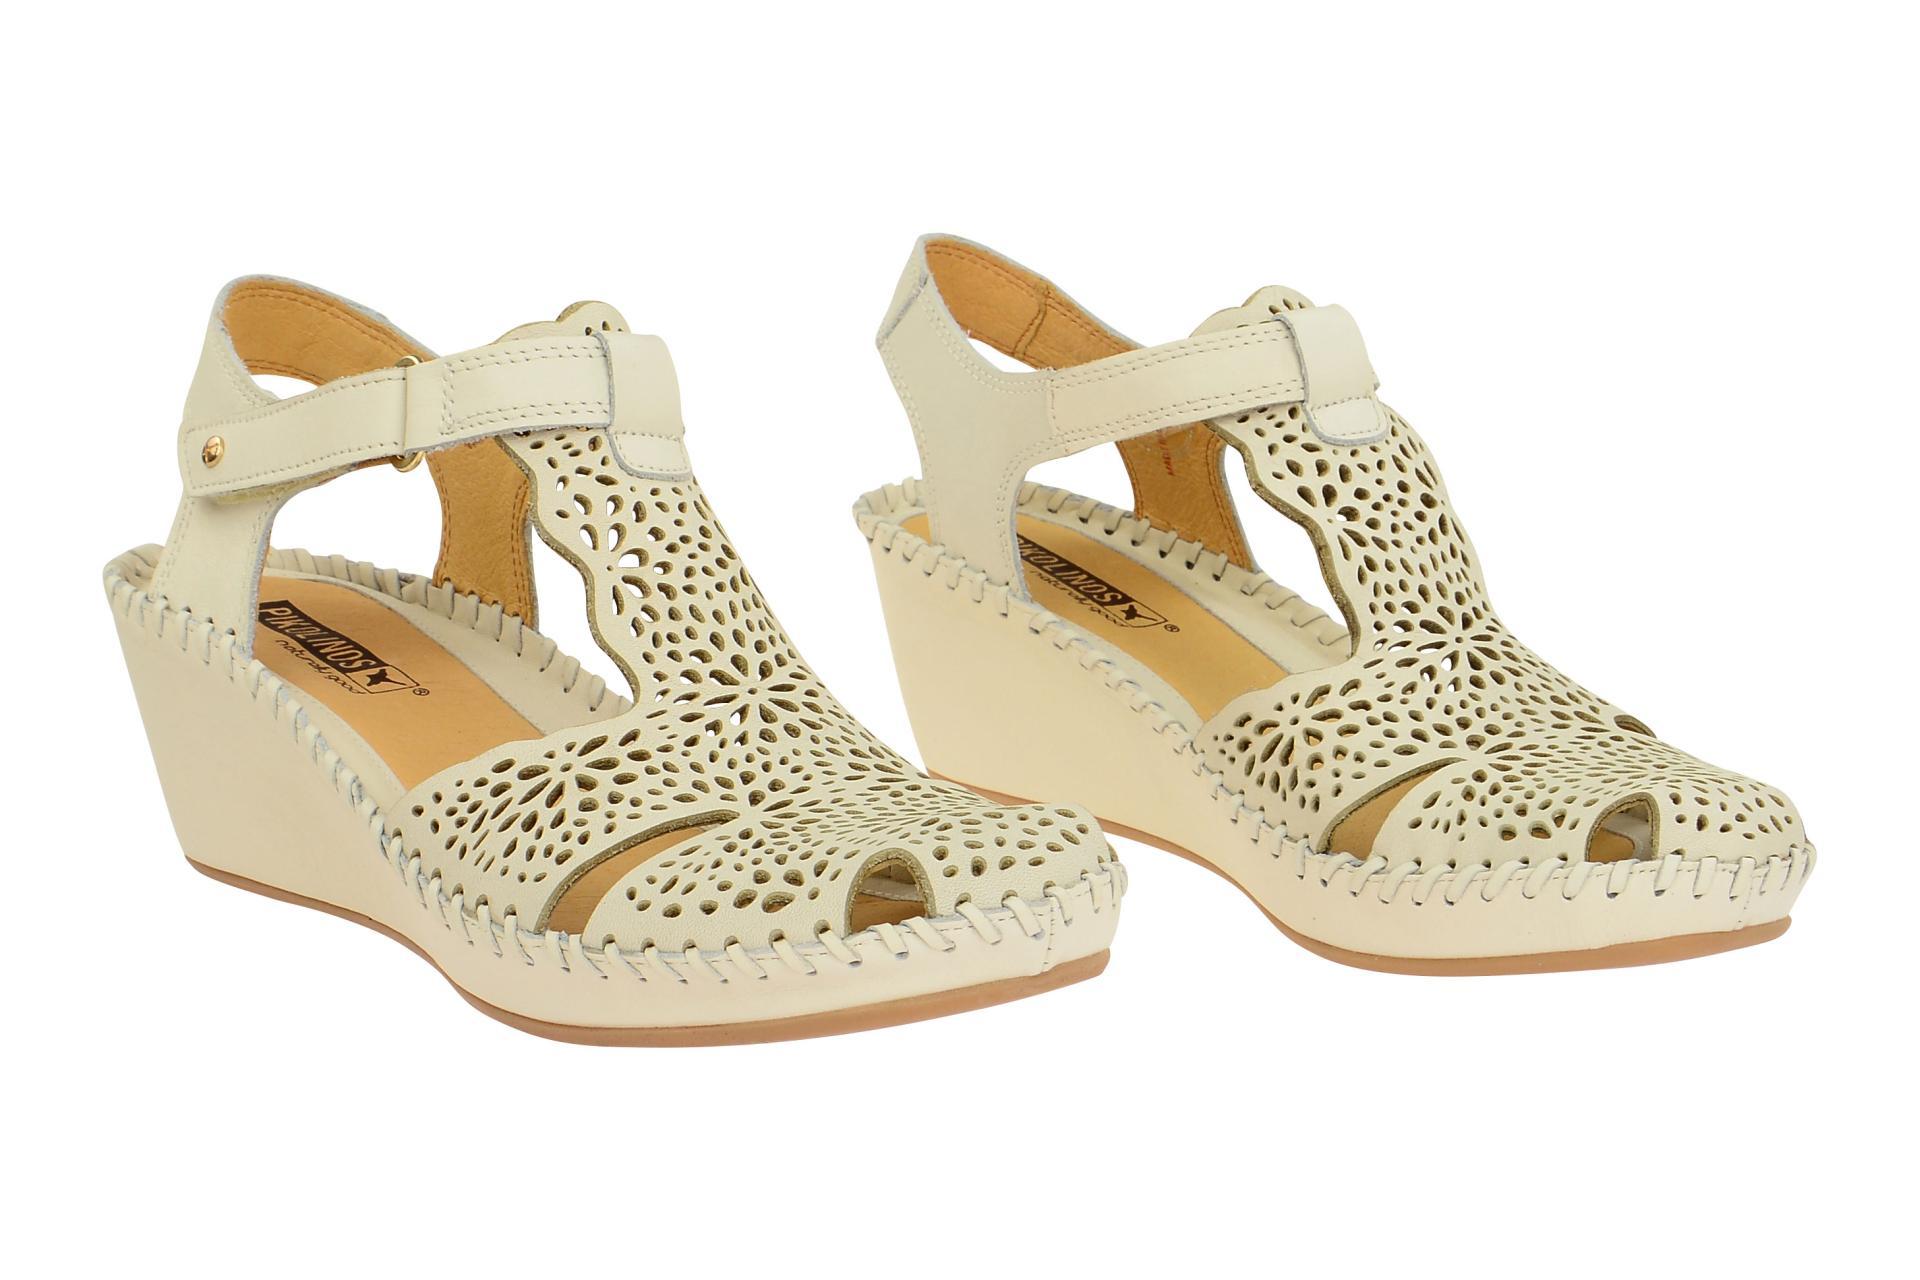 Pikolinos Schuhe MARGARITA rot Damen Sandale Sandaletten 943-0985 sandia NEU